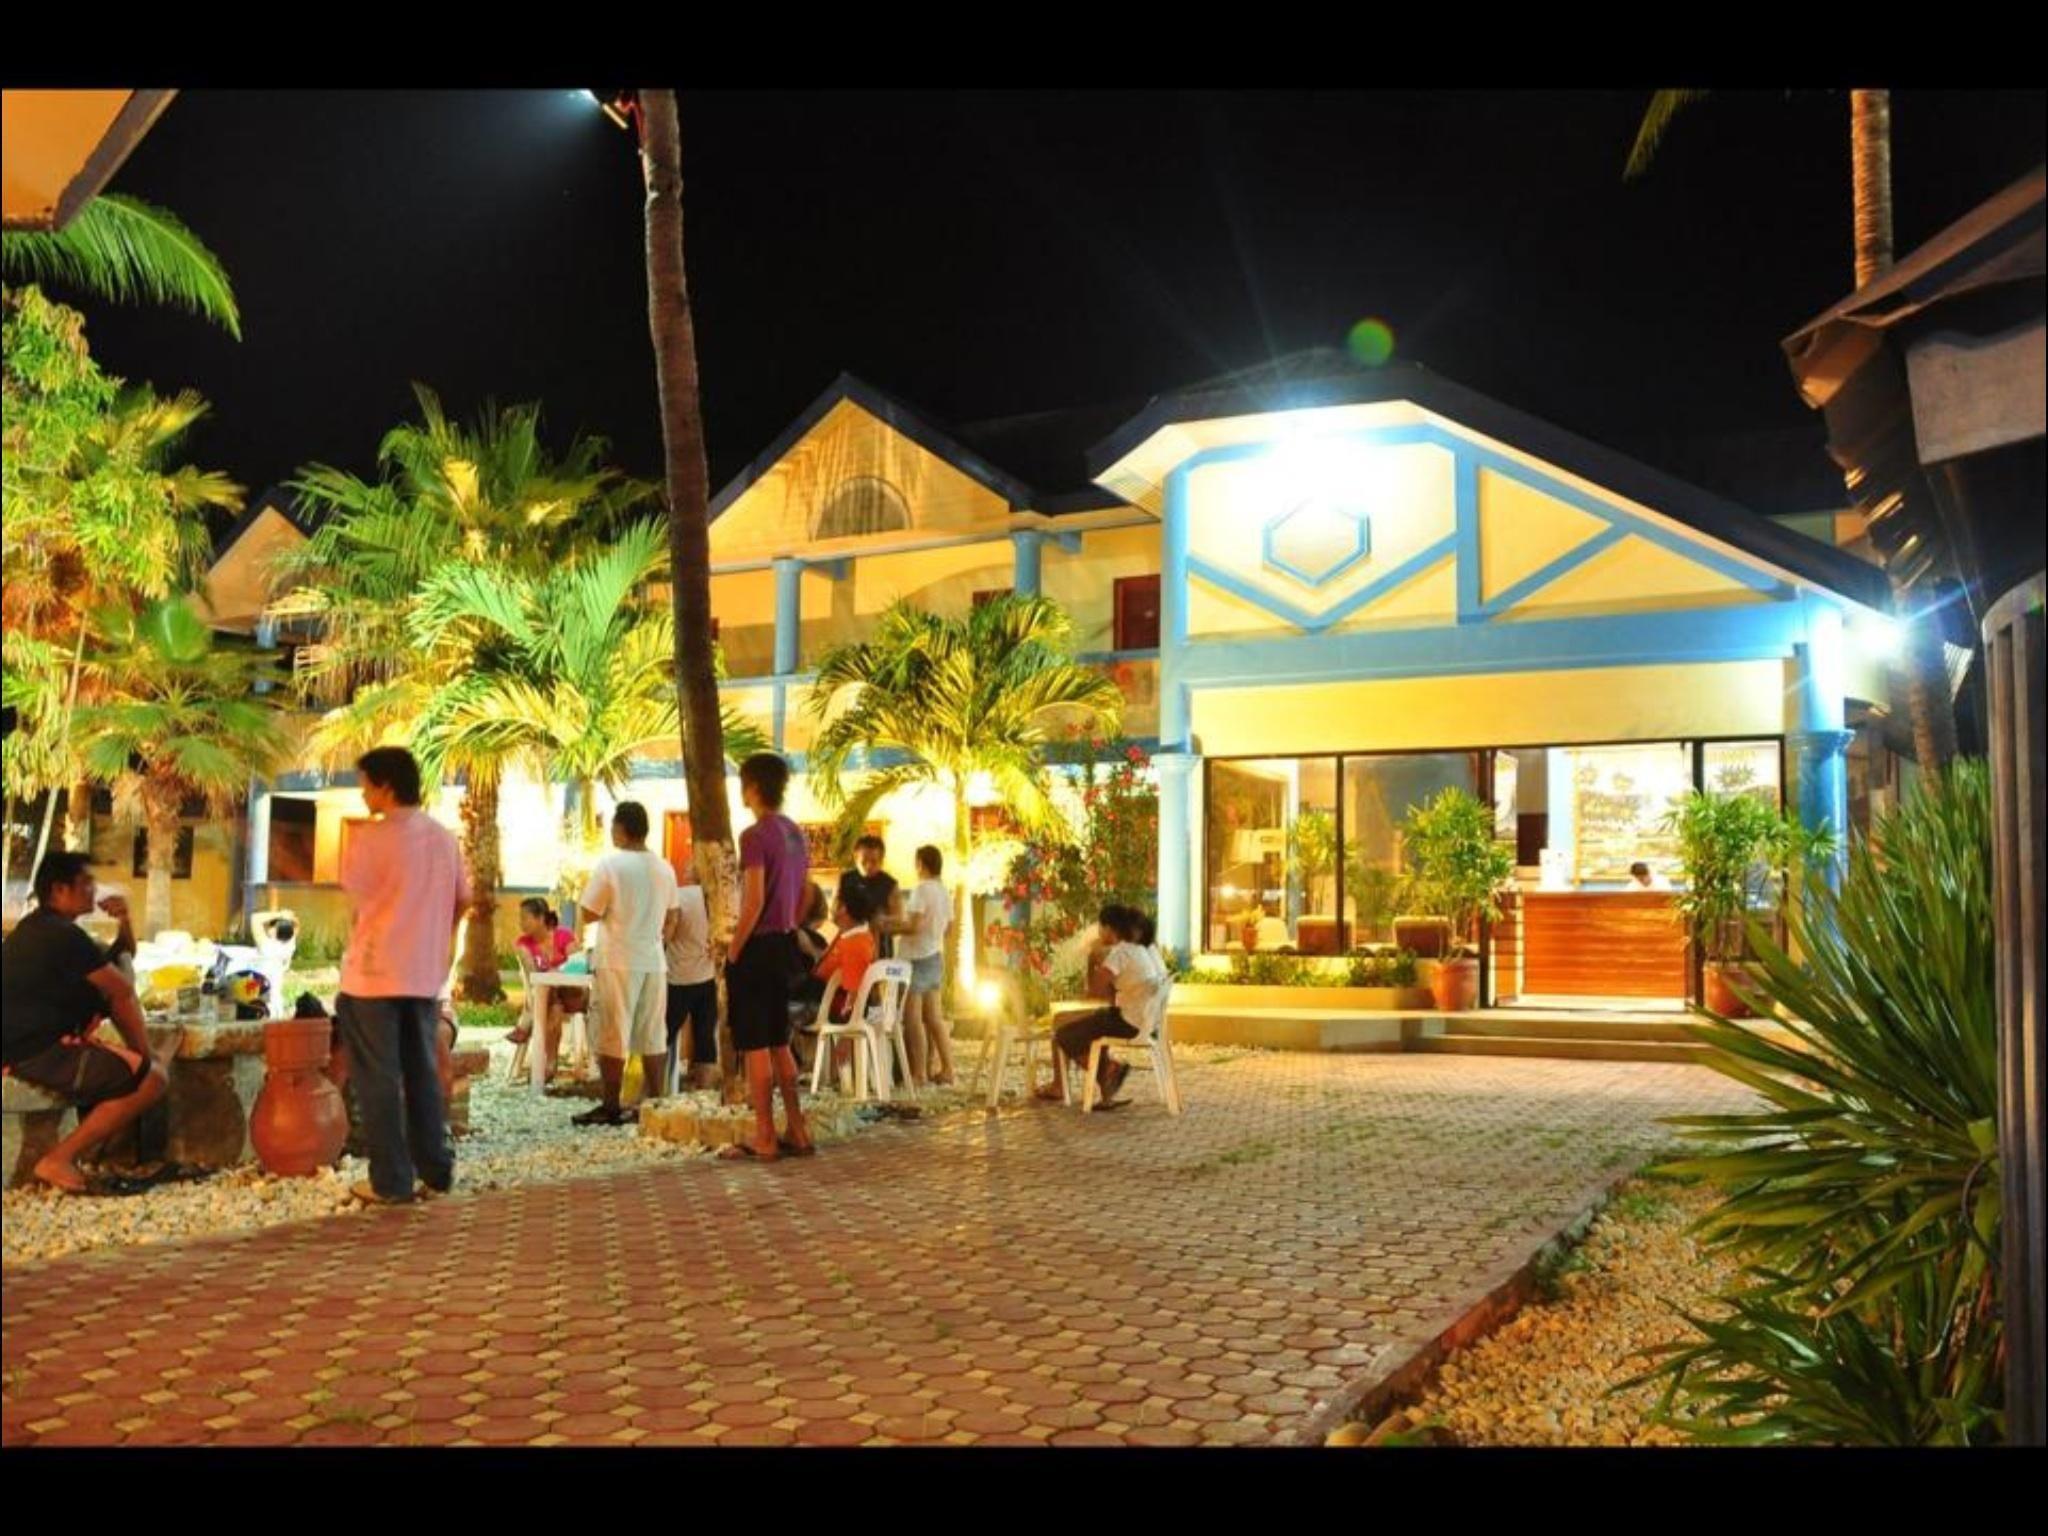 Candon Candon Beach Resort Philippines, Asia Candon Beach